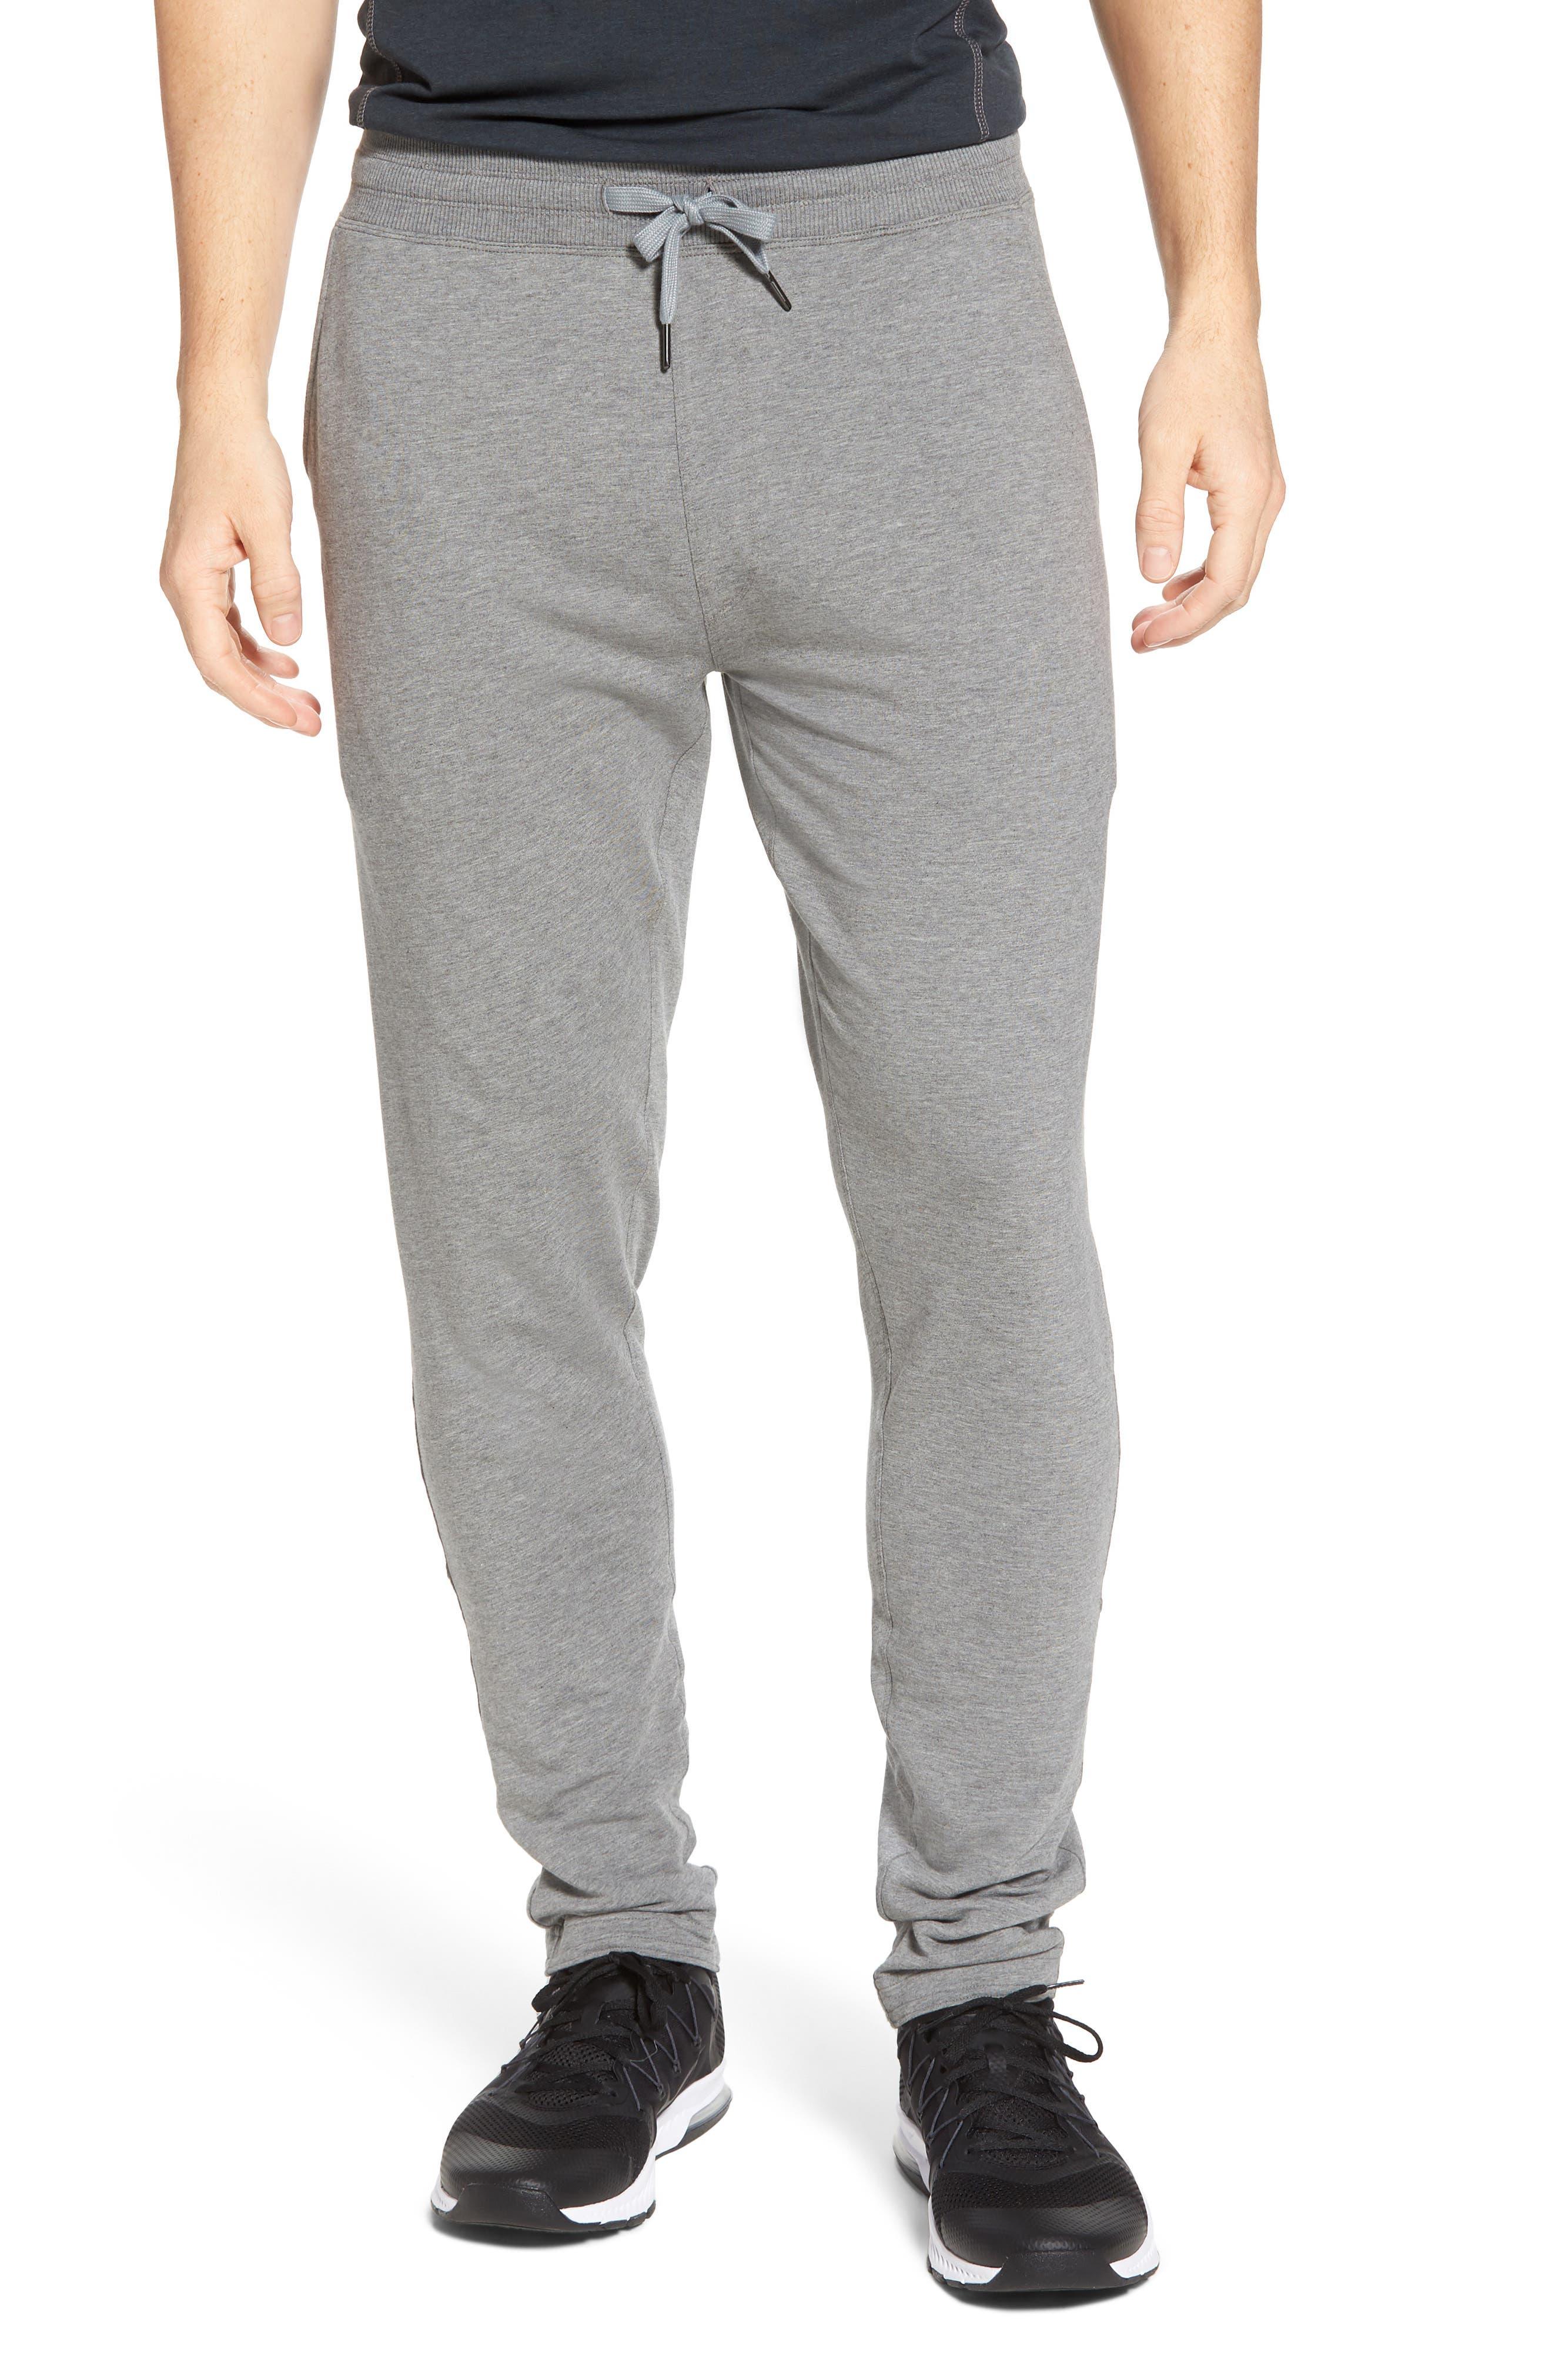 Legacy Lounge Pants,                         Main,                         color, Heather Grey